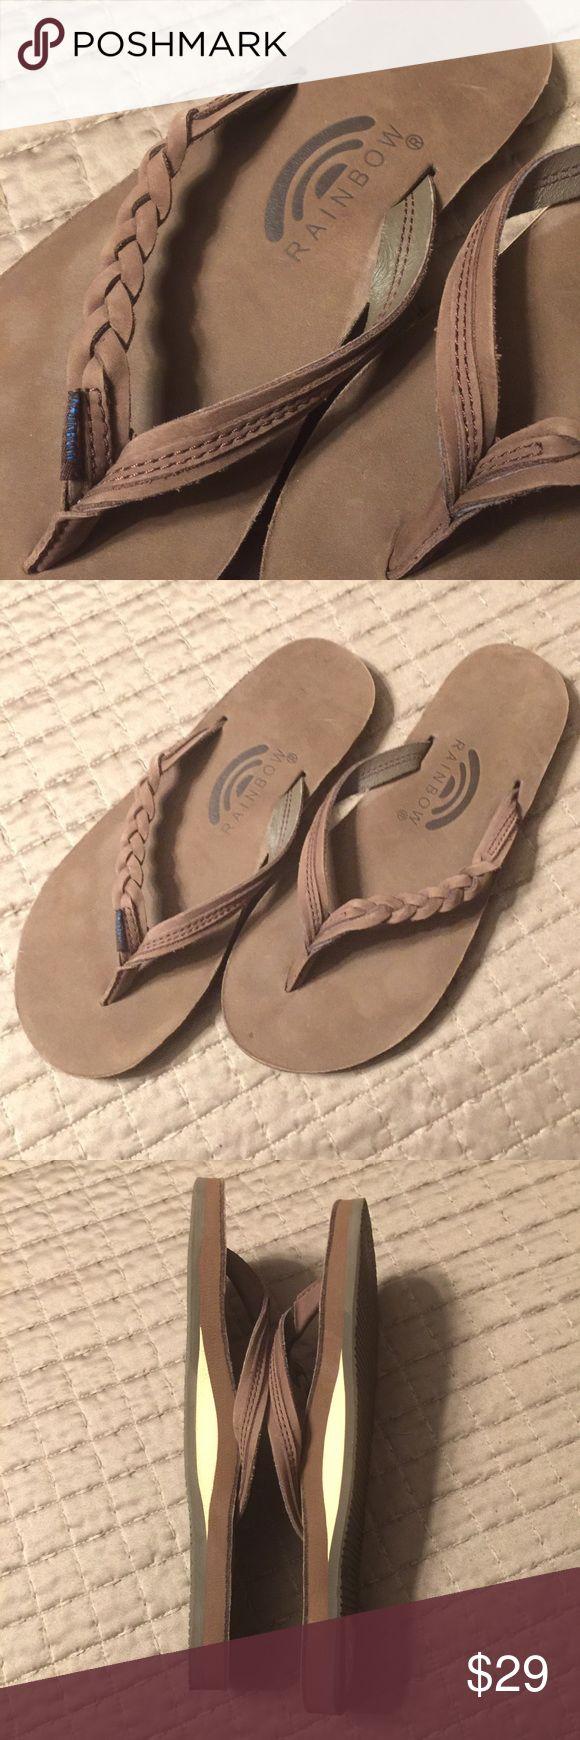 Rainbow Flip Flops Brown/Braided Rainbow Flip Flops.. Ladies size 5.5 - 6.5. Never Worn. Rainbow Shoes Sandals